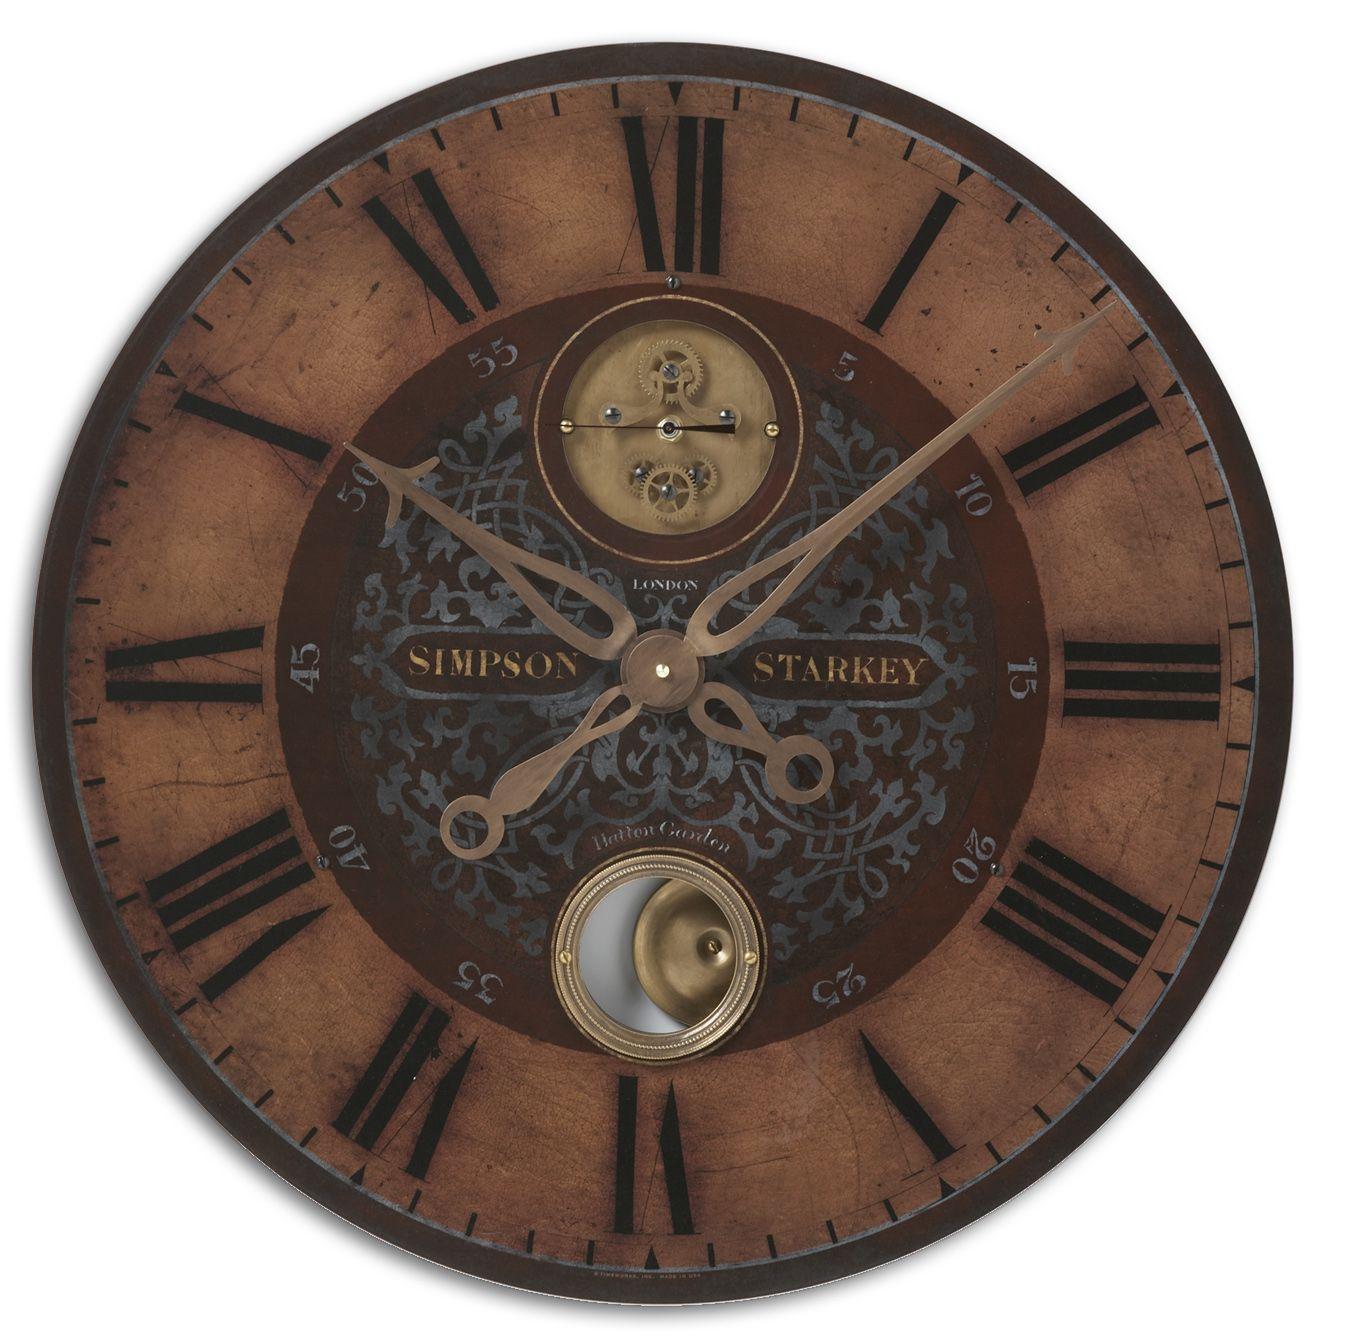 Uttermost Clocks Simpson Starkey Clock - Item Number: 06038